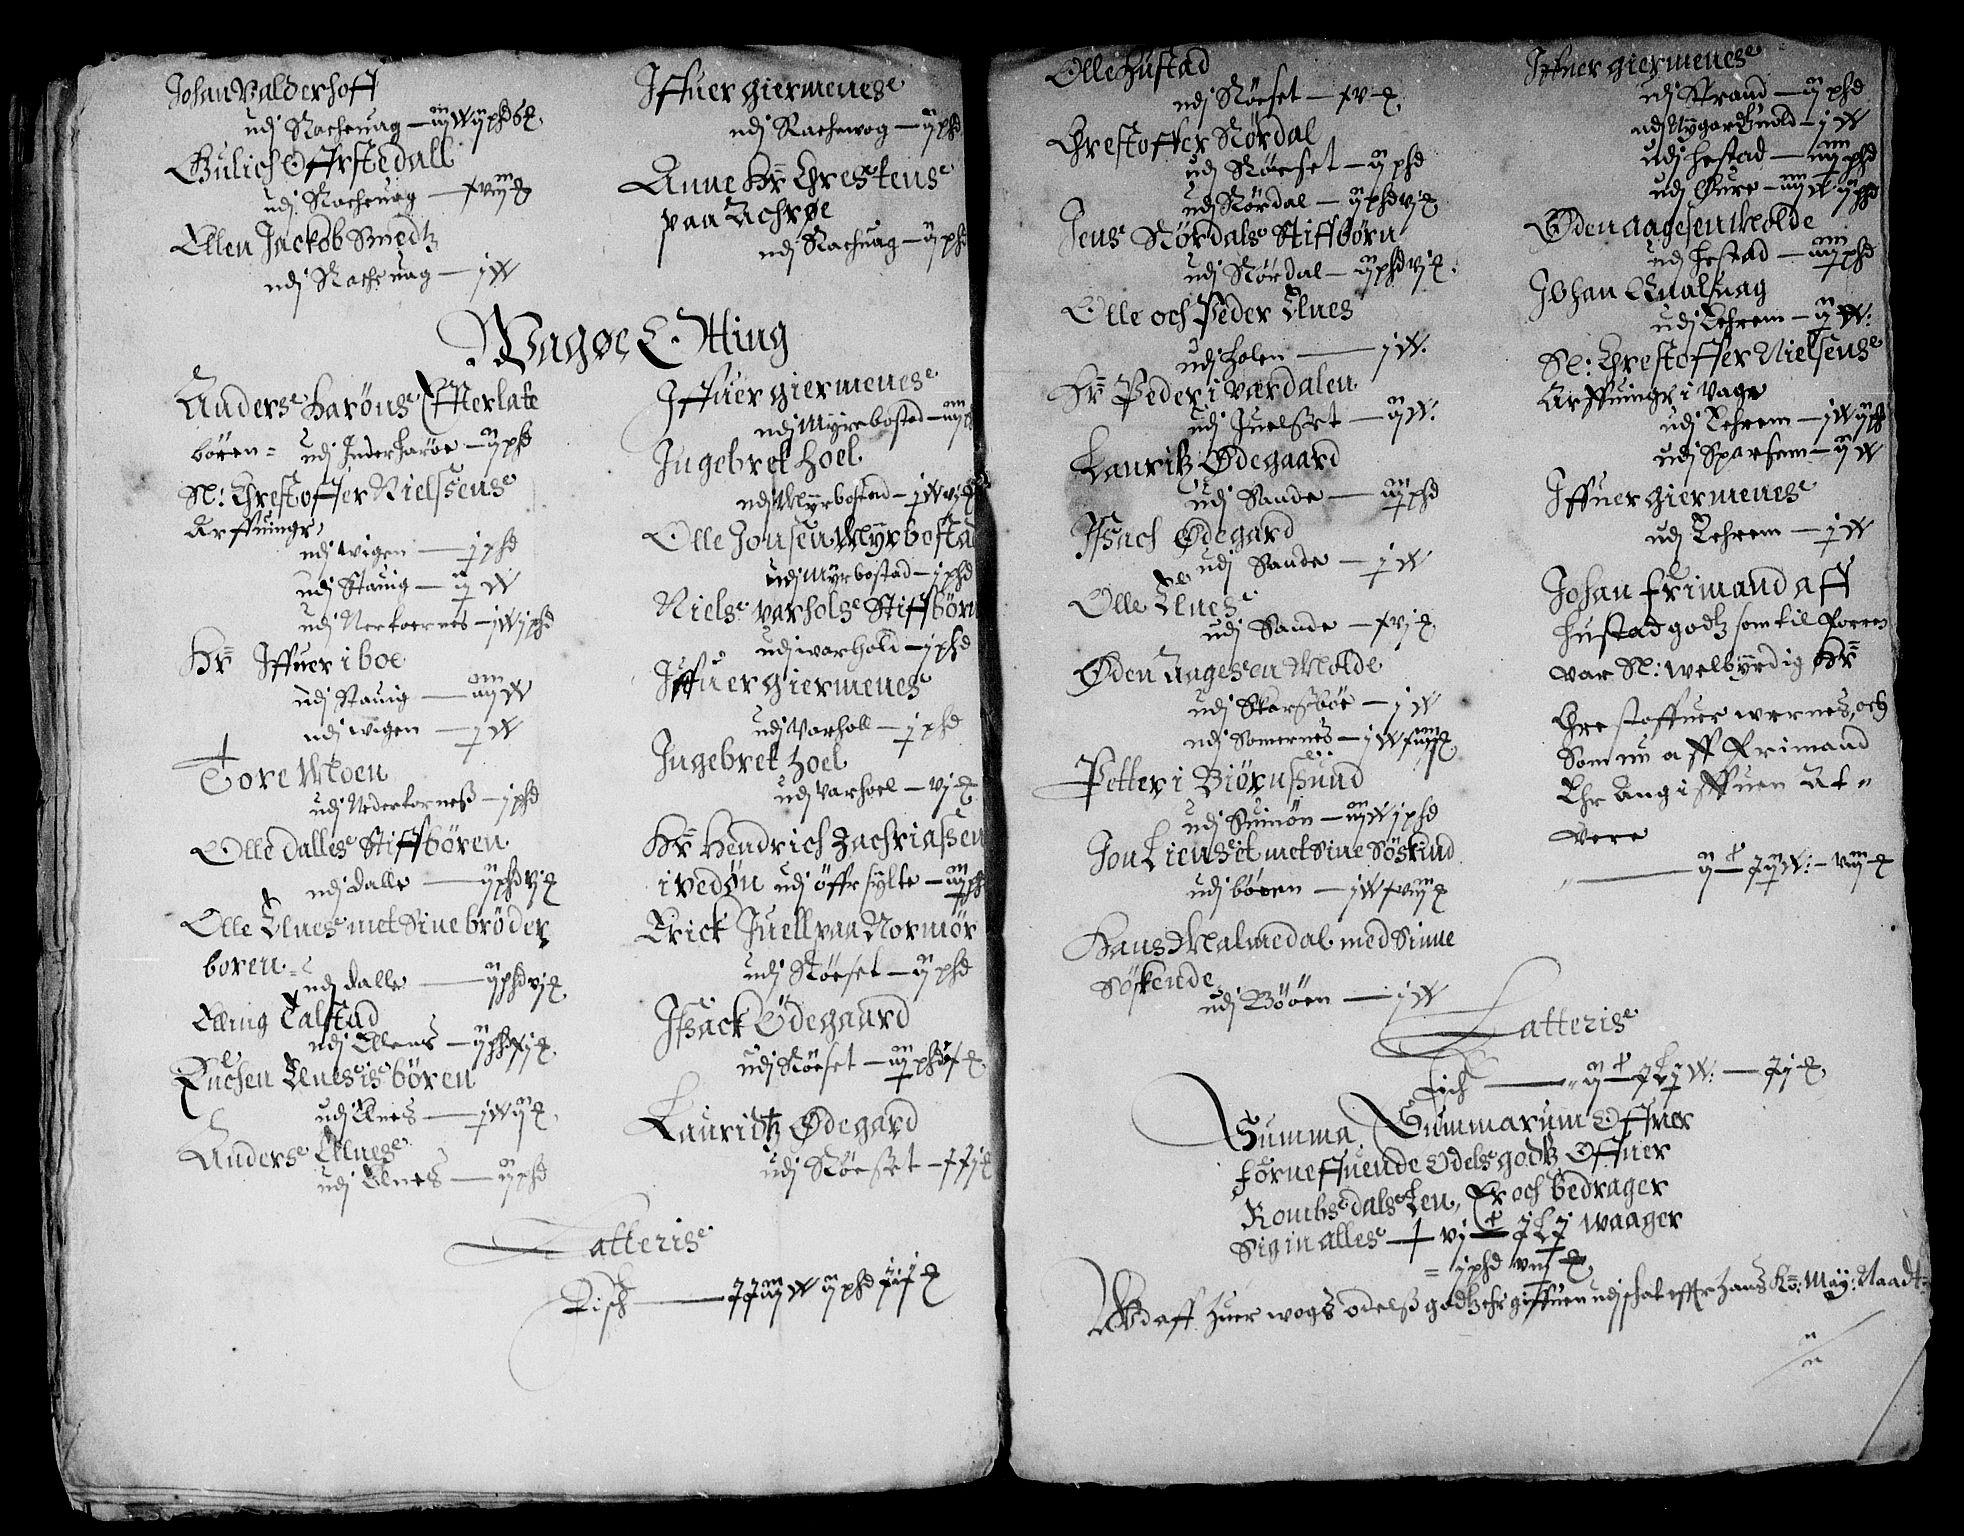 RA, Rentekammeret inntil 1814, Reviderte regnskaper, Stiftamtstueregnskaper, Trondheim stiftamt og Nordland amt, R/Rd/L0010: Trondheim stiftamt, 1664